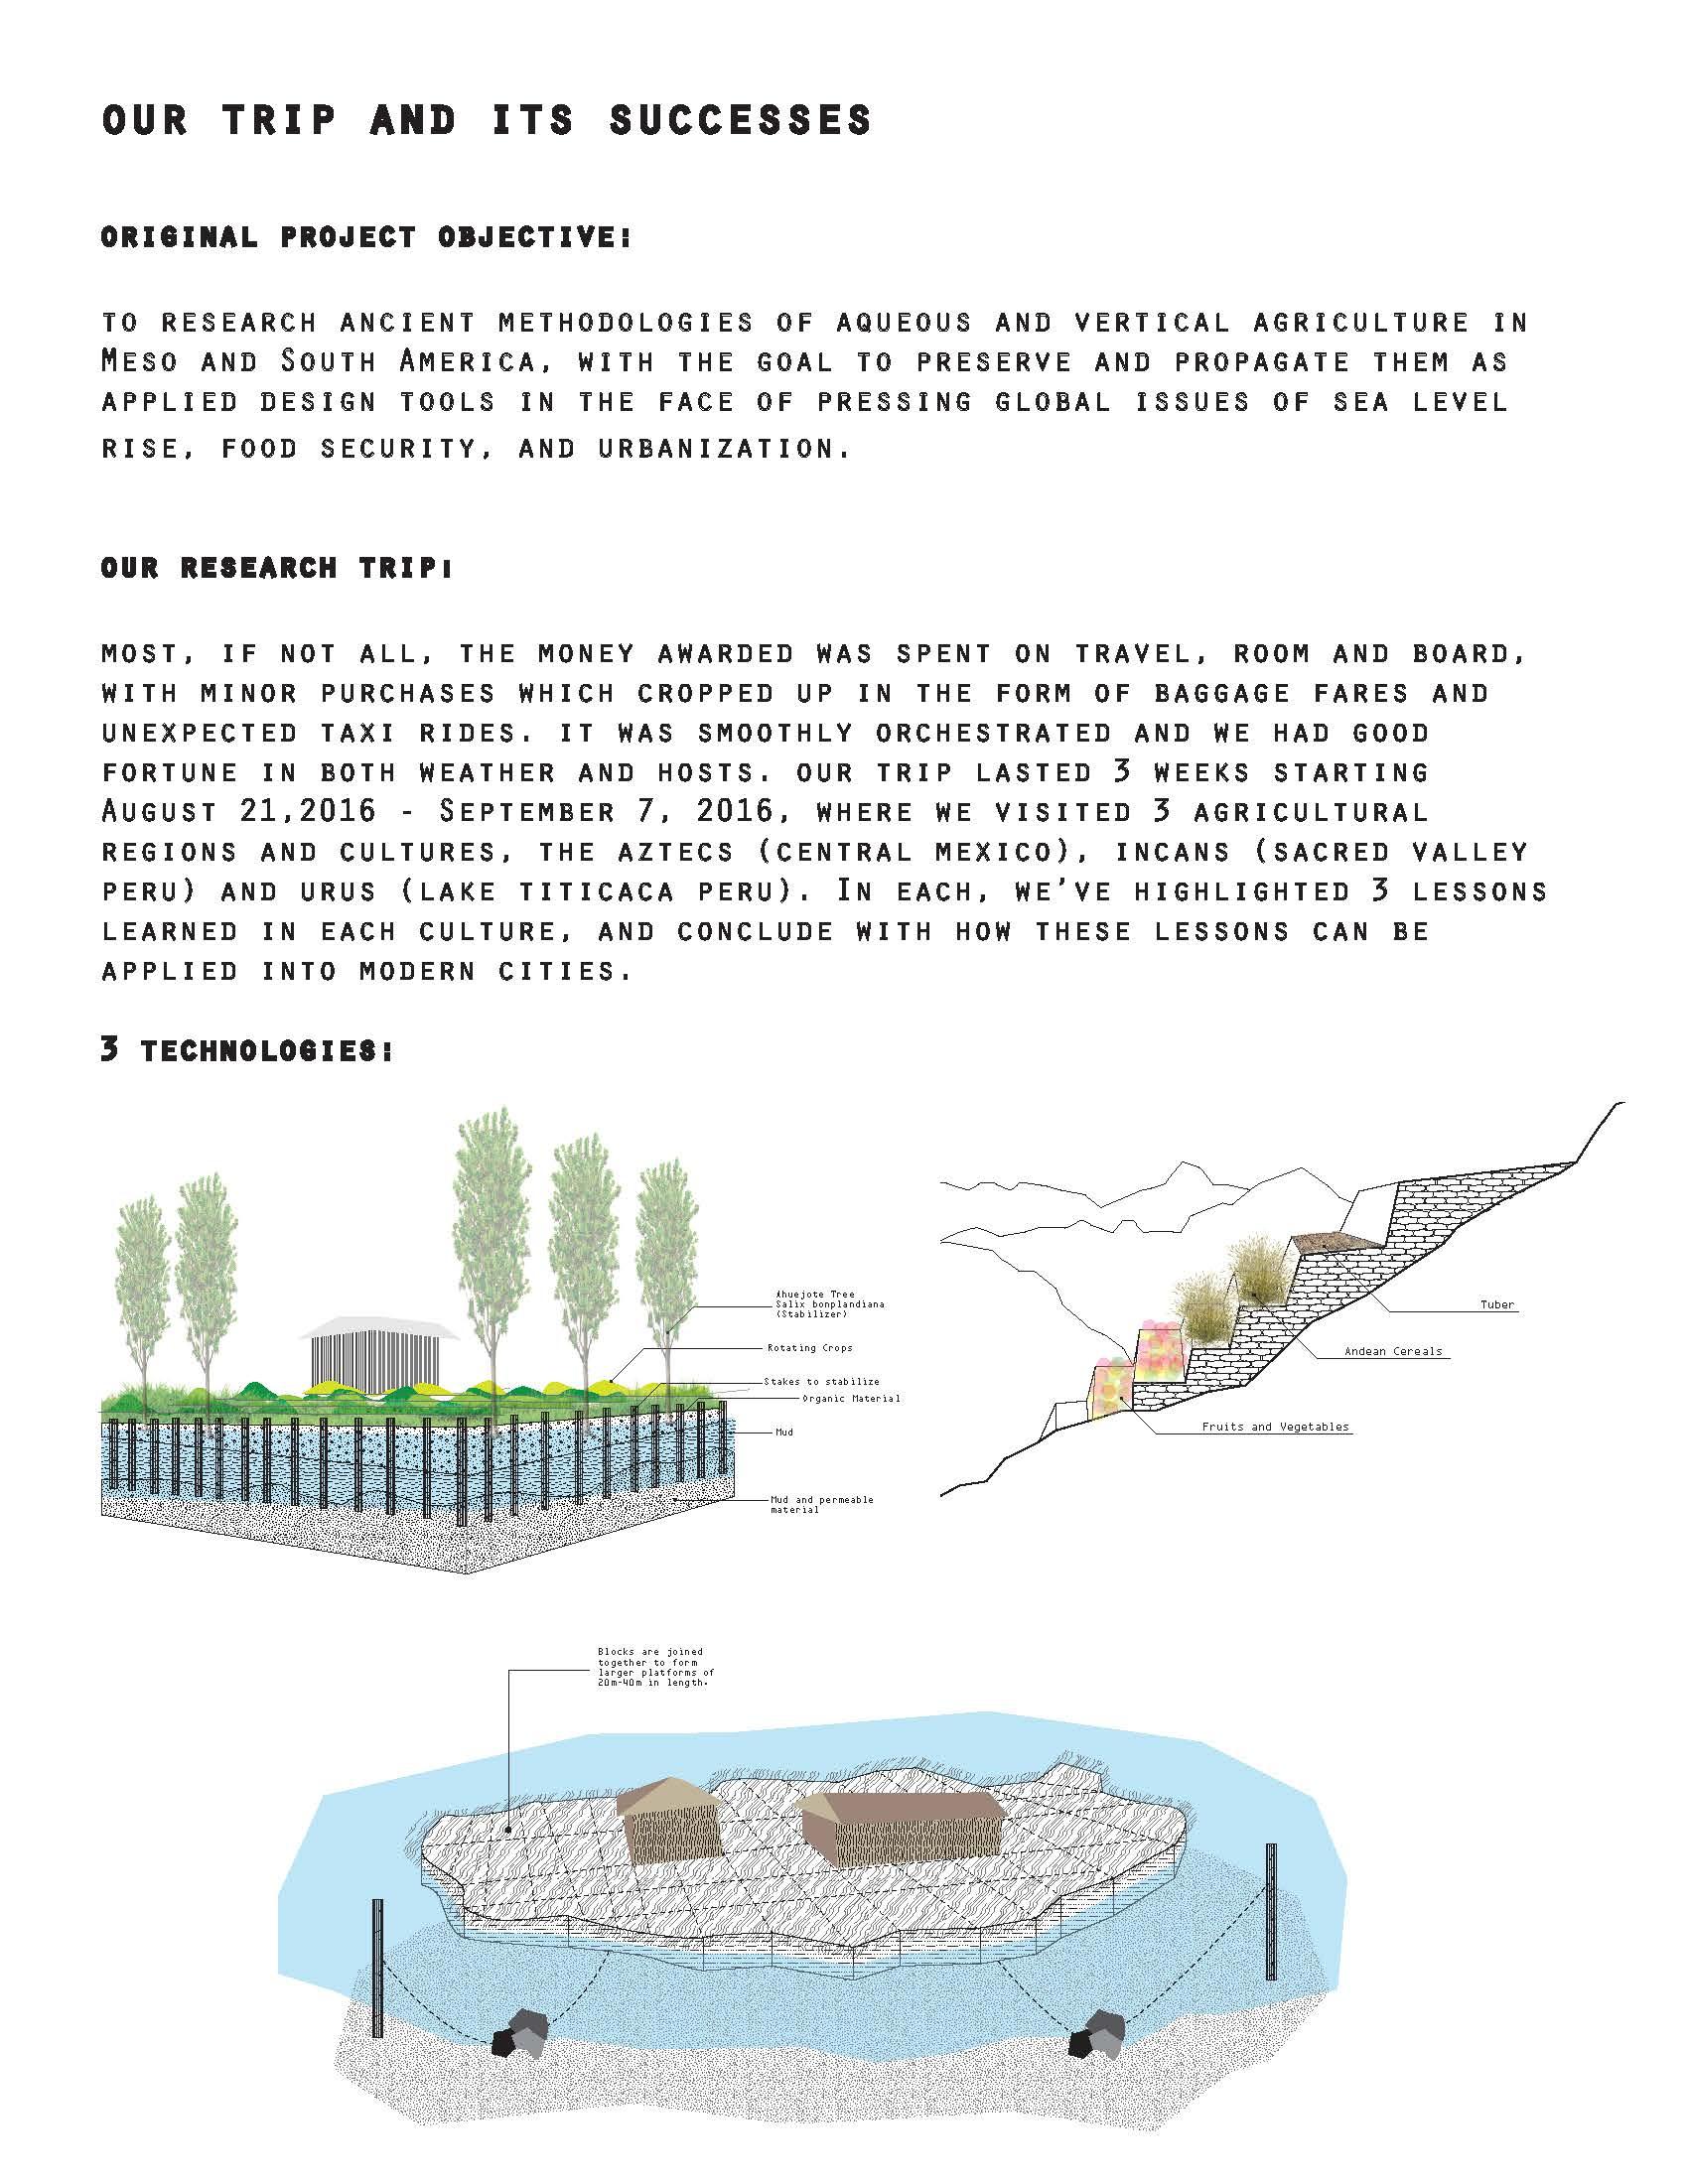 2017_LANDSCAPE ARCHITECTURE_WAKEFIELD + SILVA-SANTISTEBAN_Page_02.jpg